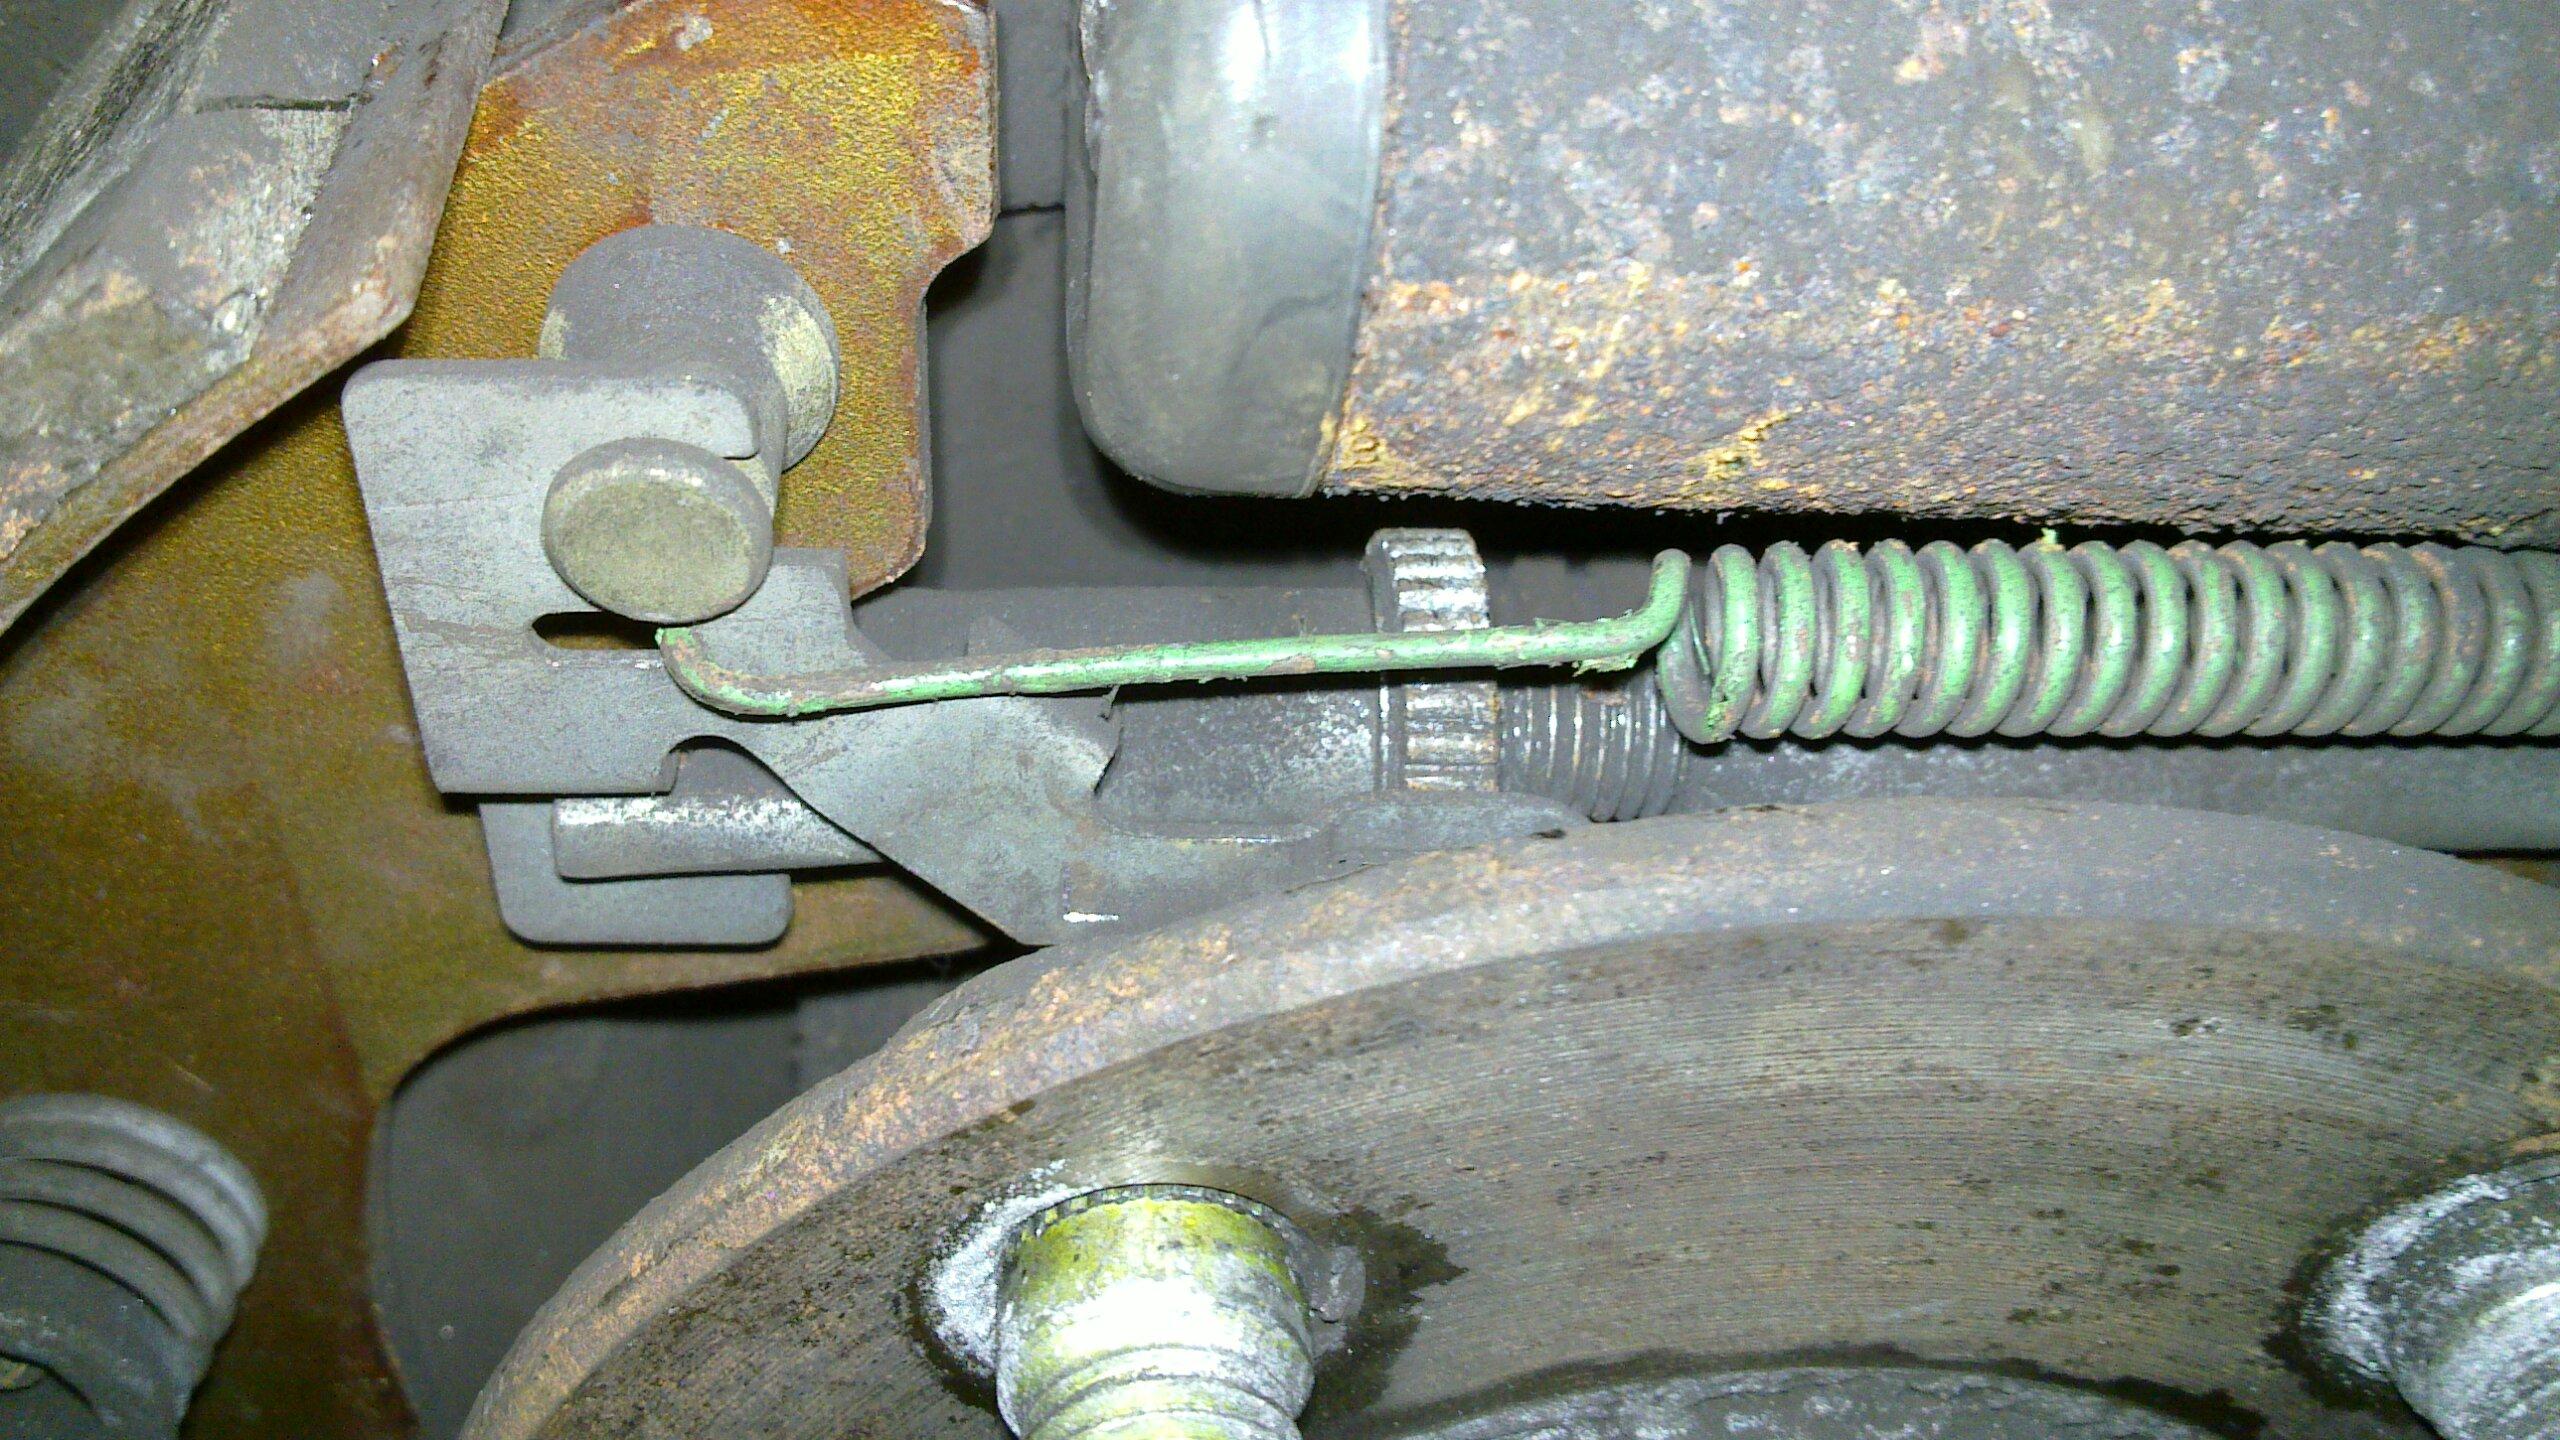 Taurus Drum Brakes Again Random Scribblings Ford Diagram Brake Auto Adjust Mechanism